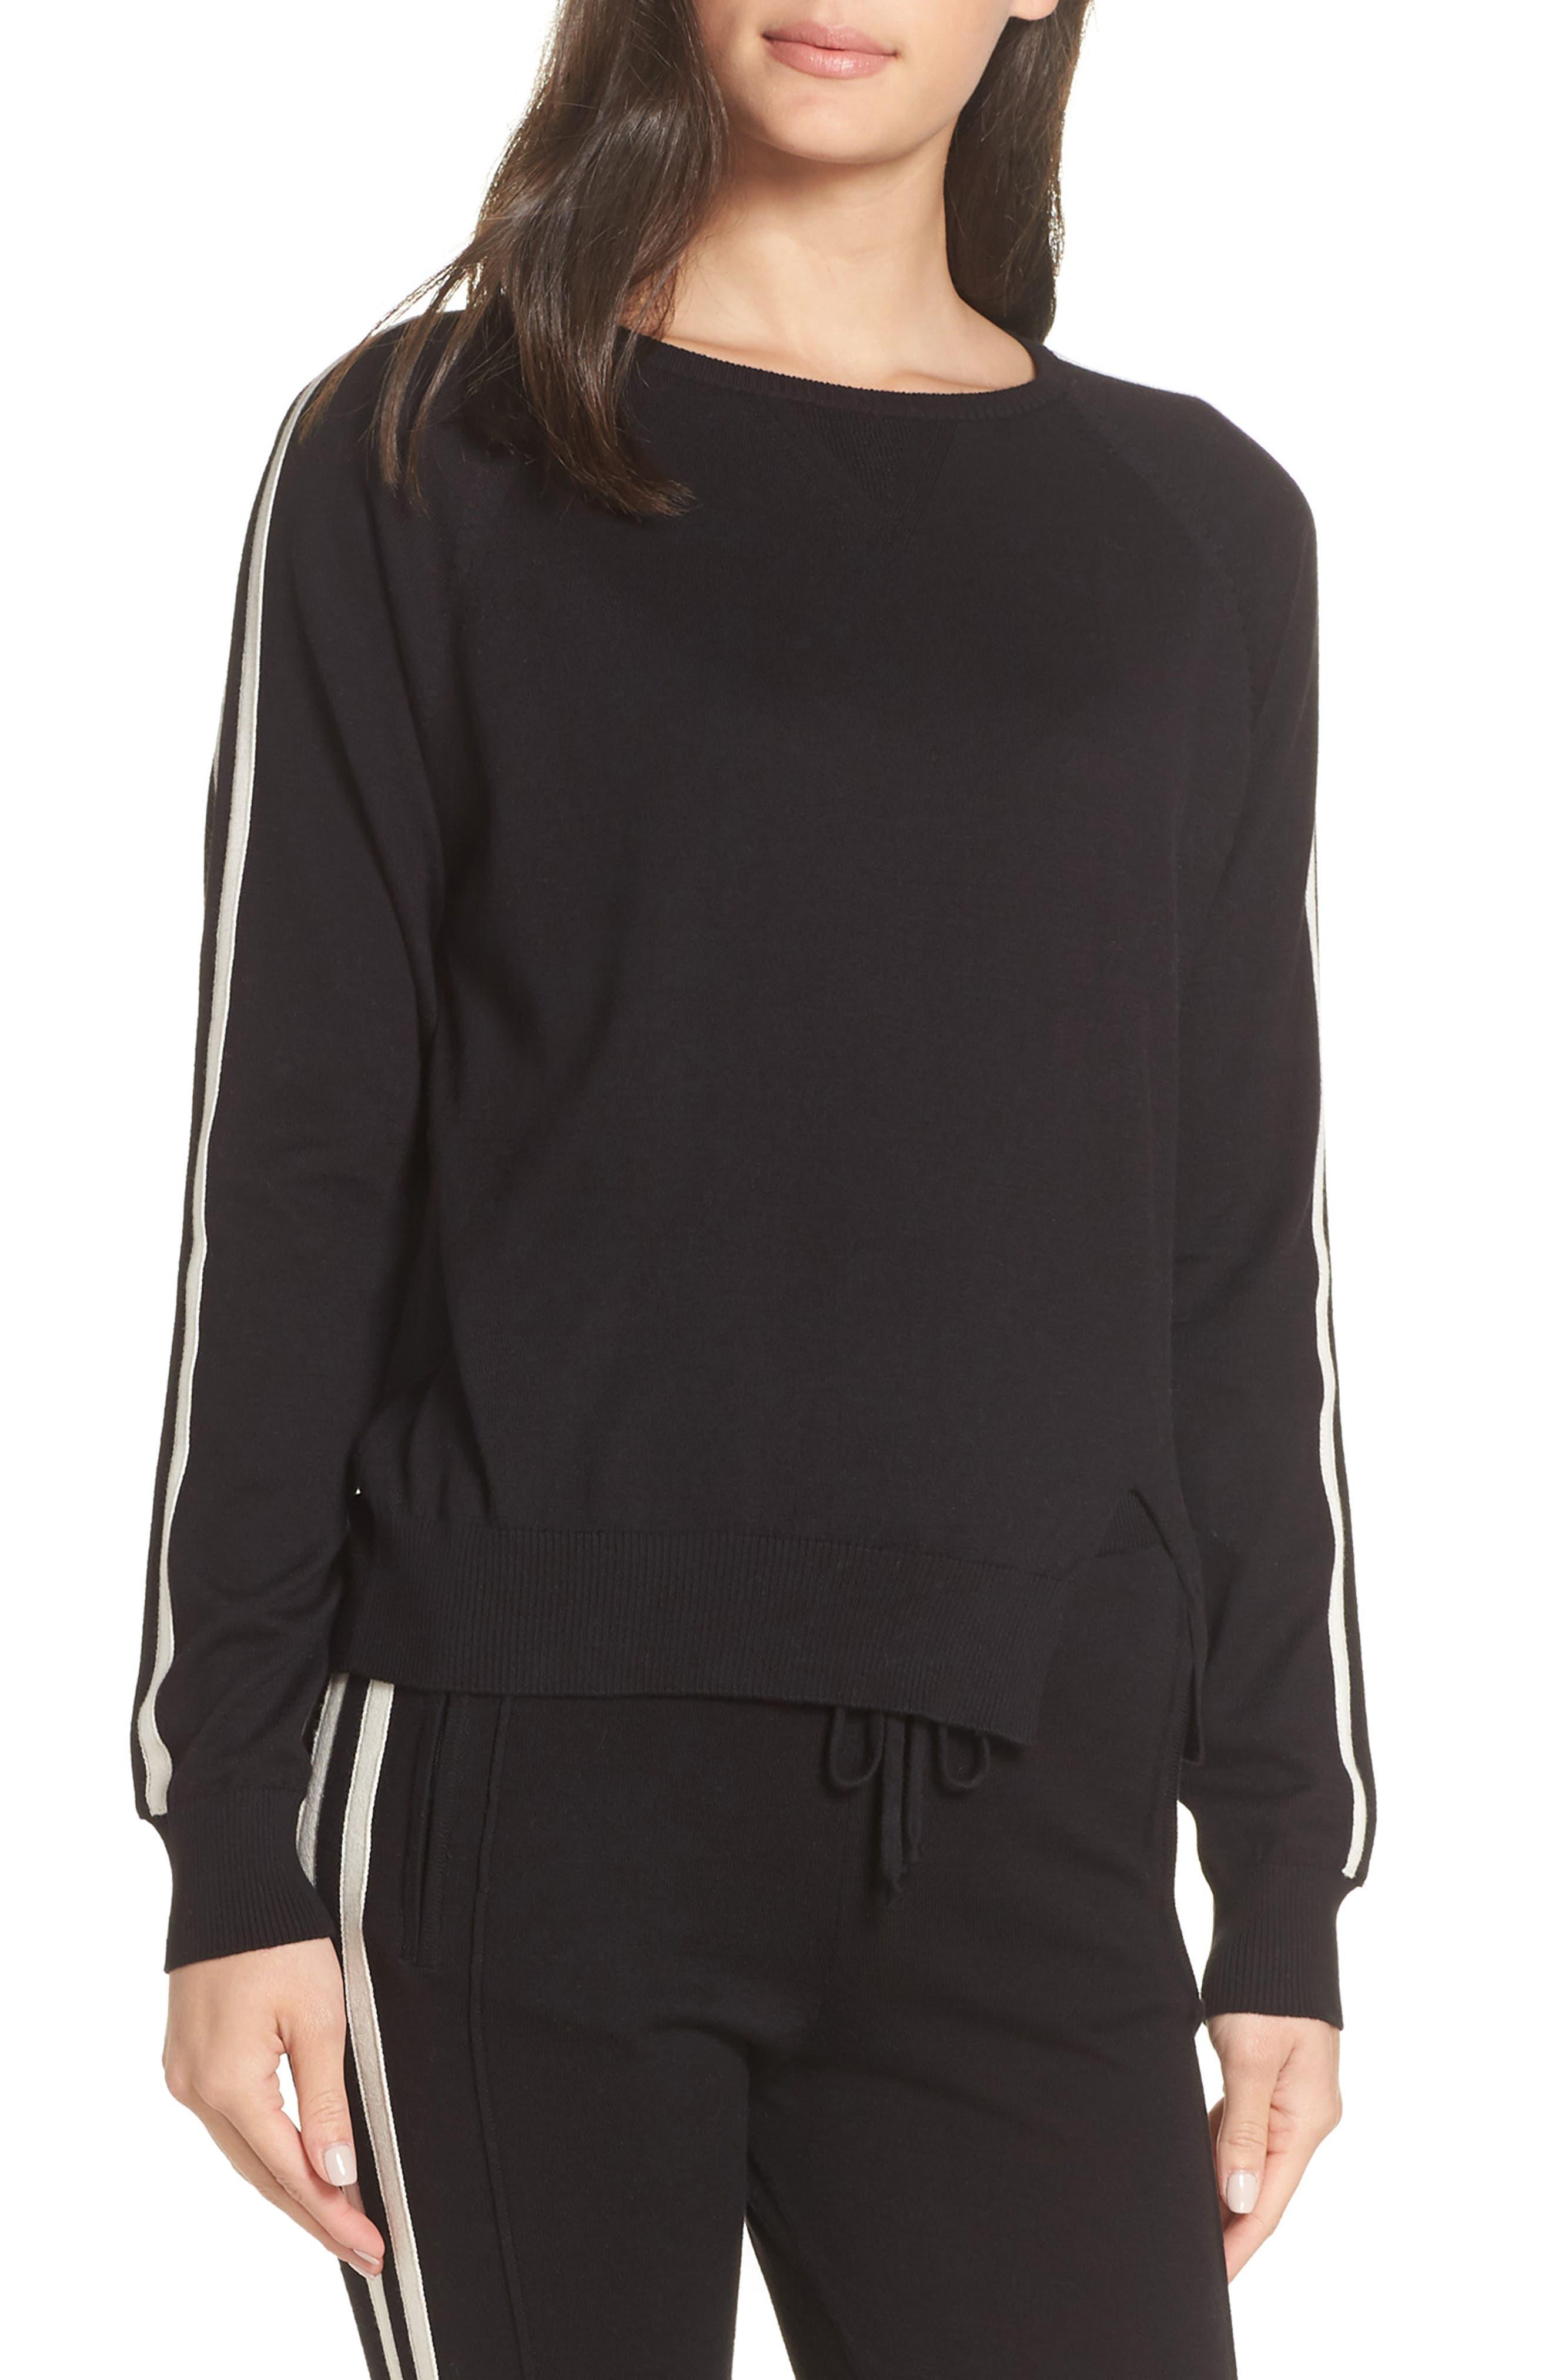 RAGDOLL Stripe Lounge Sweatshirt in Black/ White